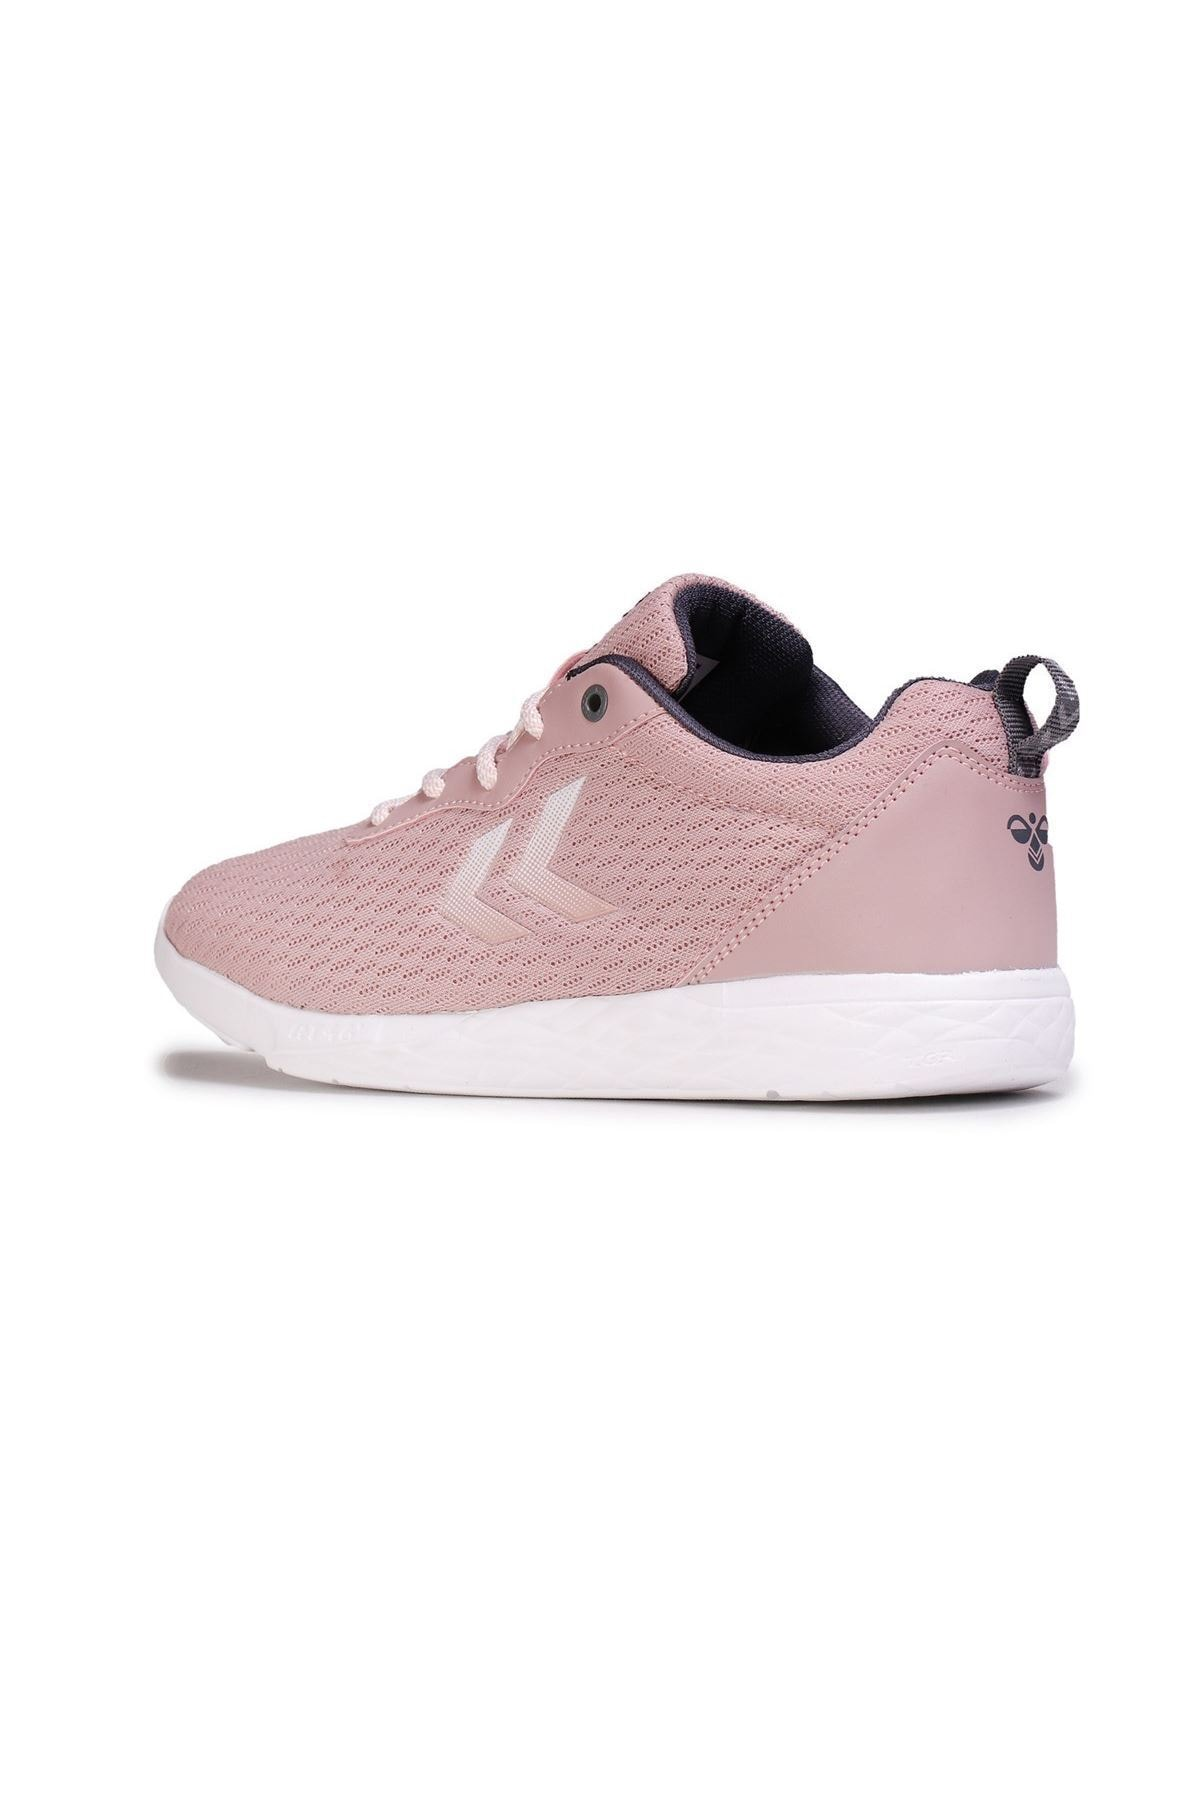 HUMMEL Unisex Pembe Hmloslo Sneaker Spor Ayakkabı 2